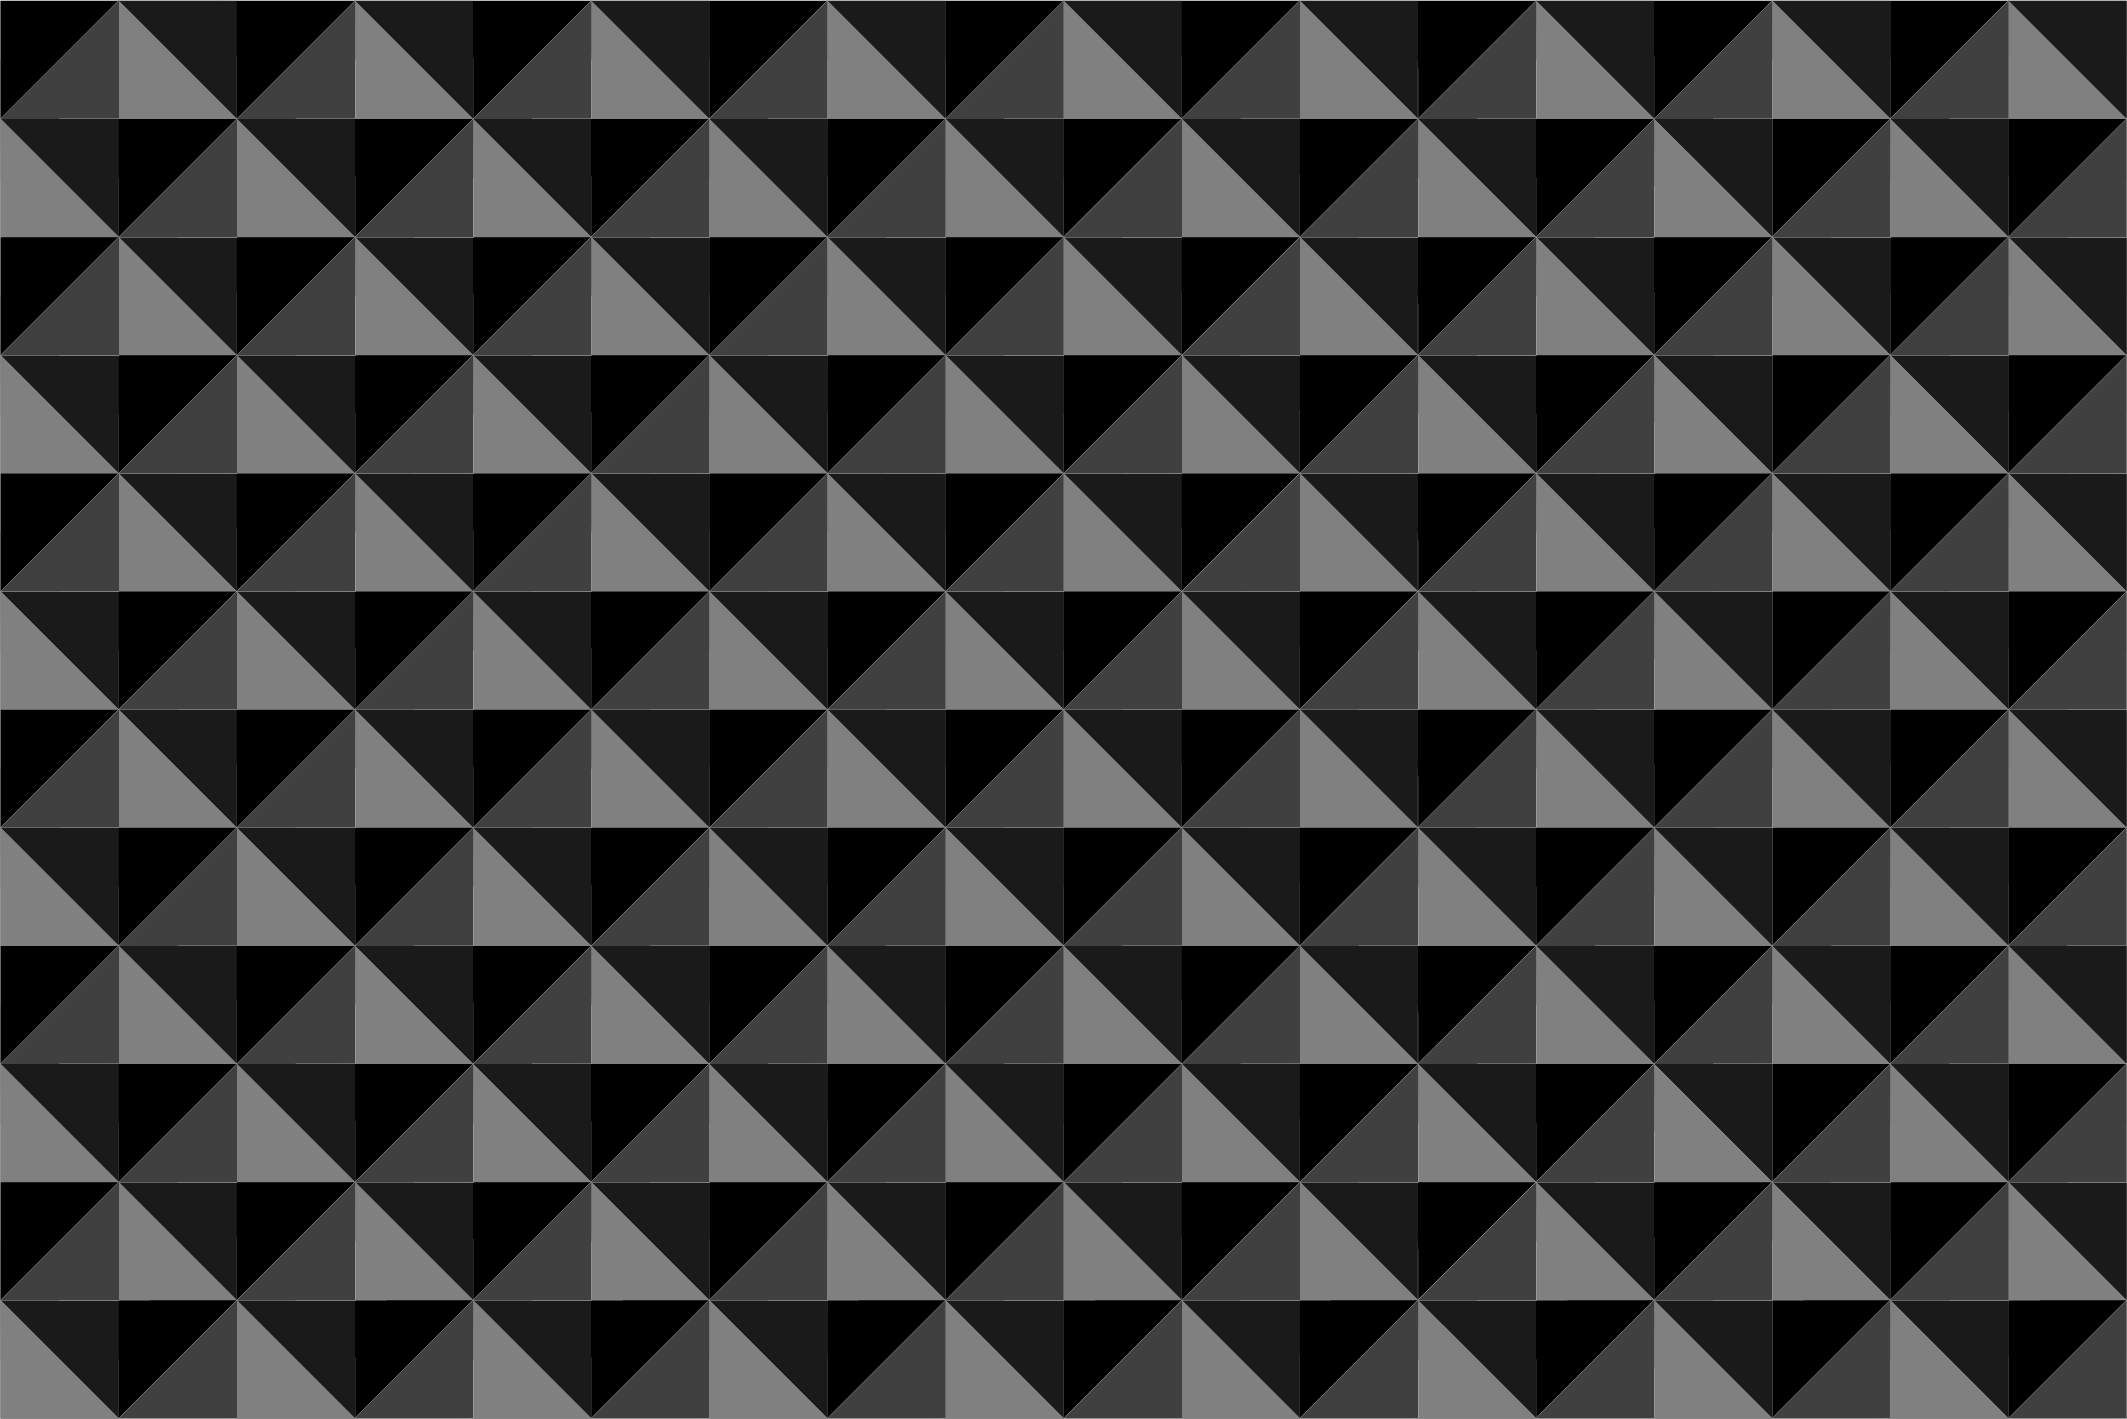 Dark seamless geometric textures example image 2